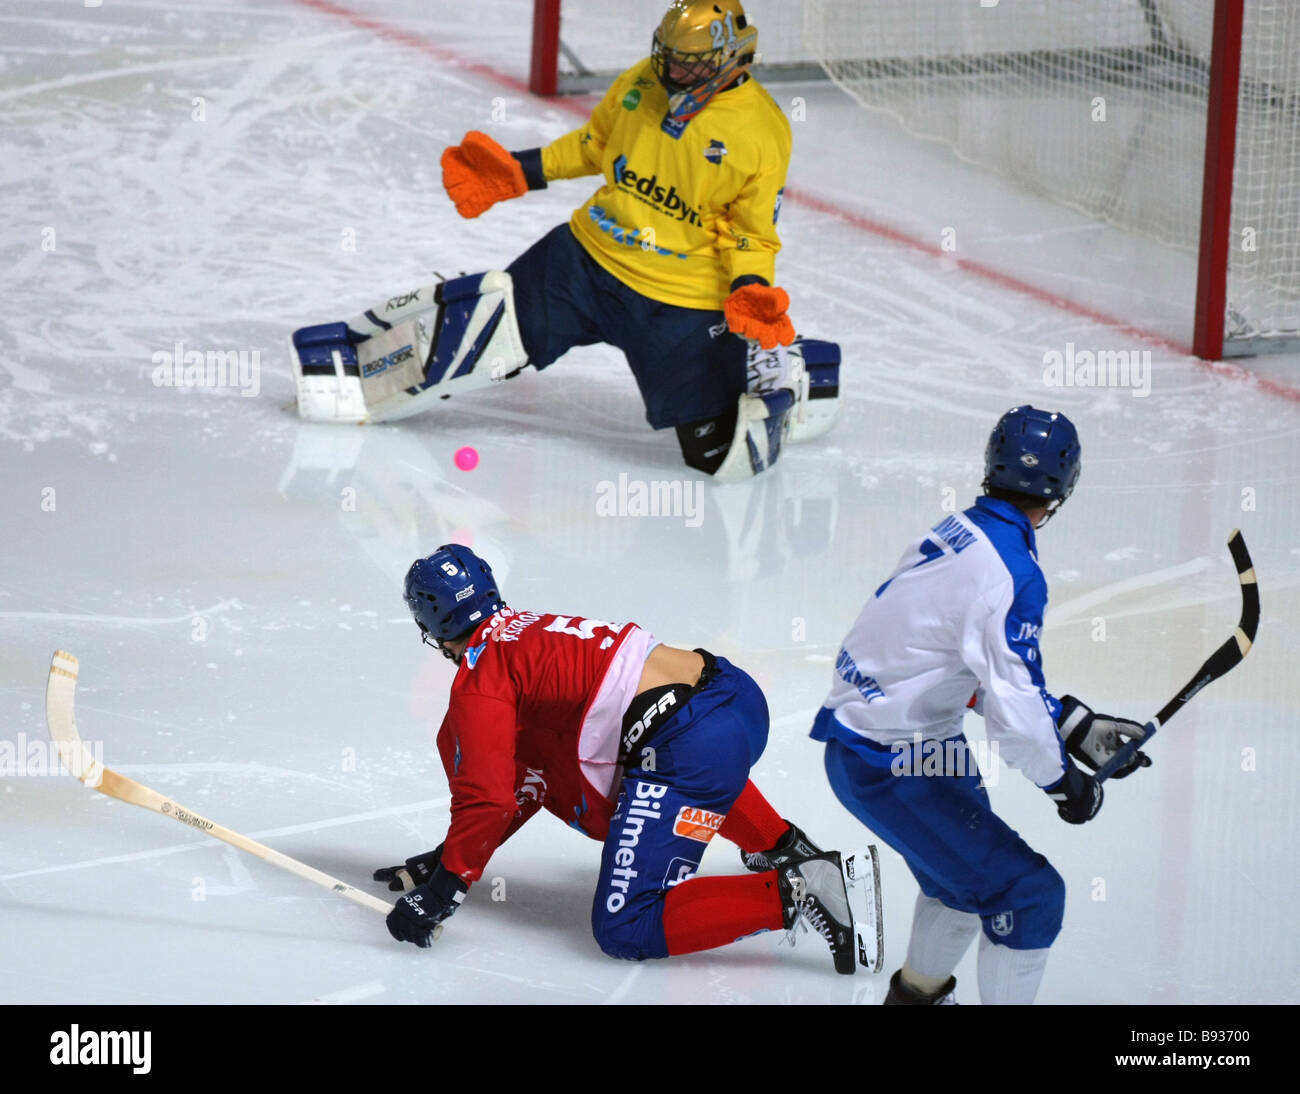 Risky moment near Edsbyn s goal in the decisive match in the Krylatskoye Stadium between Edsbyn Sweden and Dinamo - Stock Image